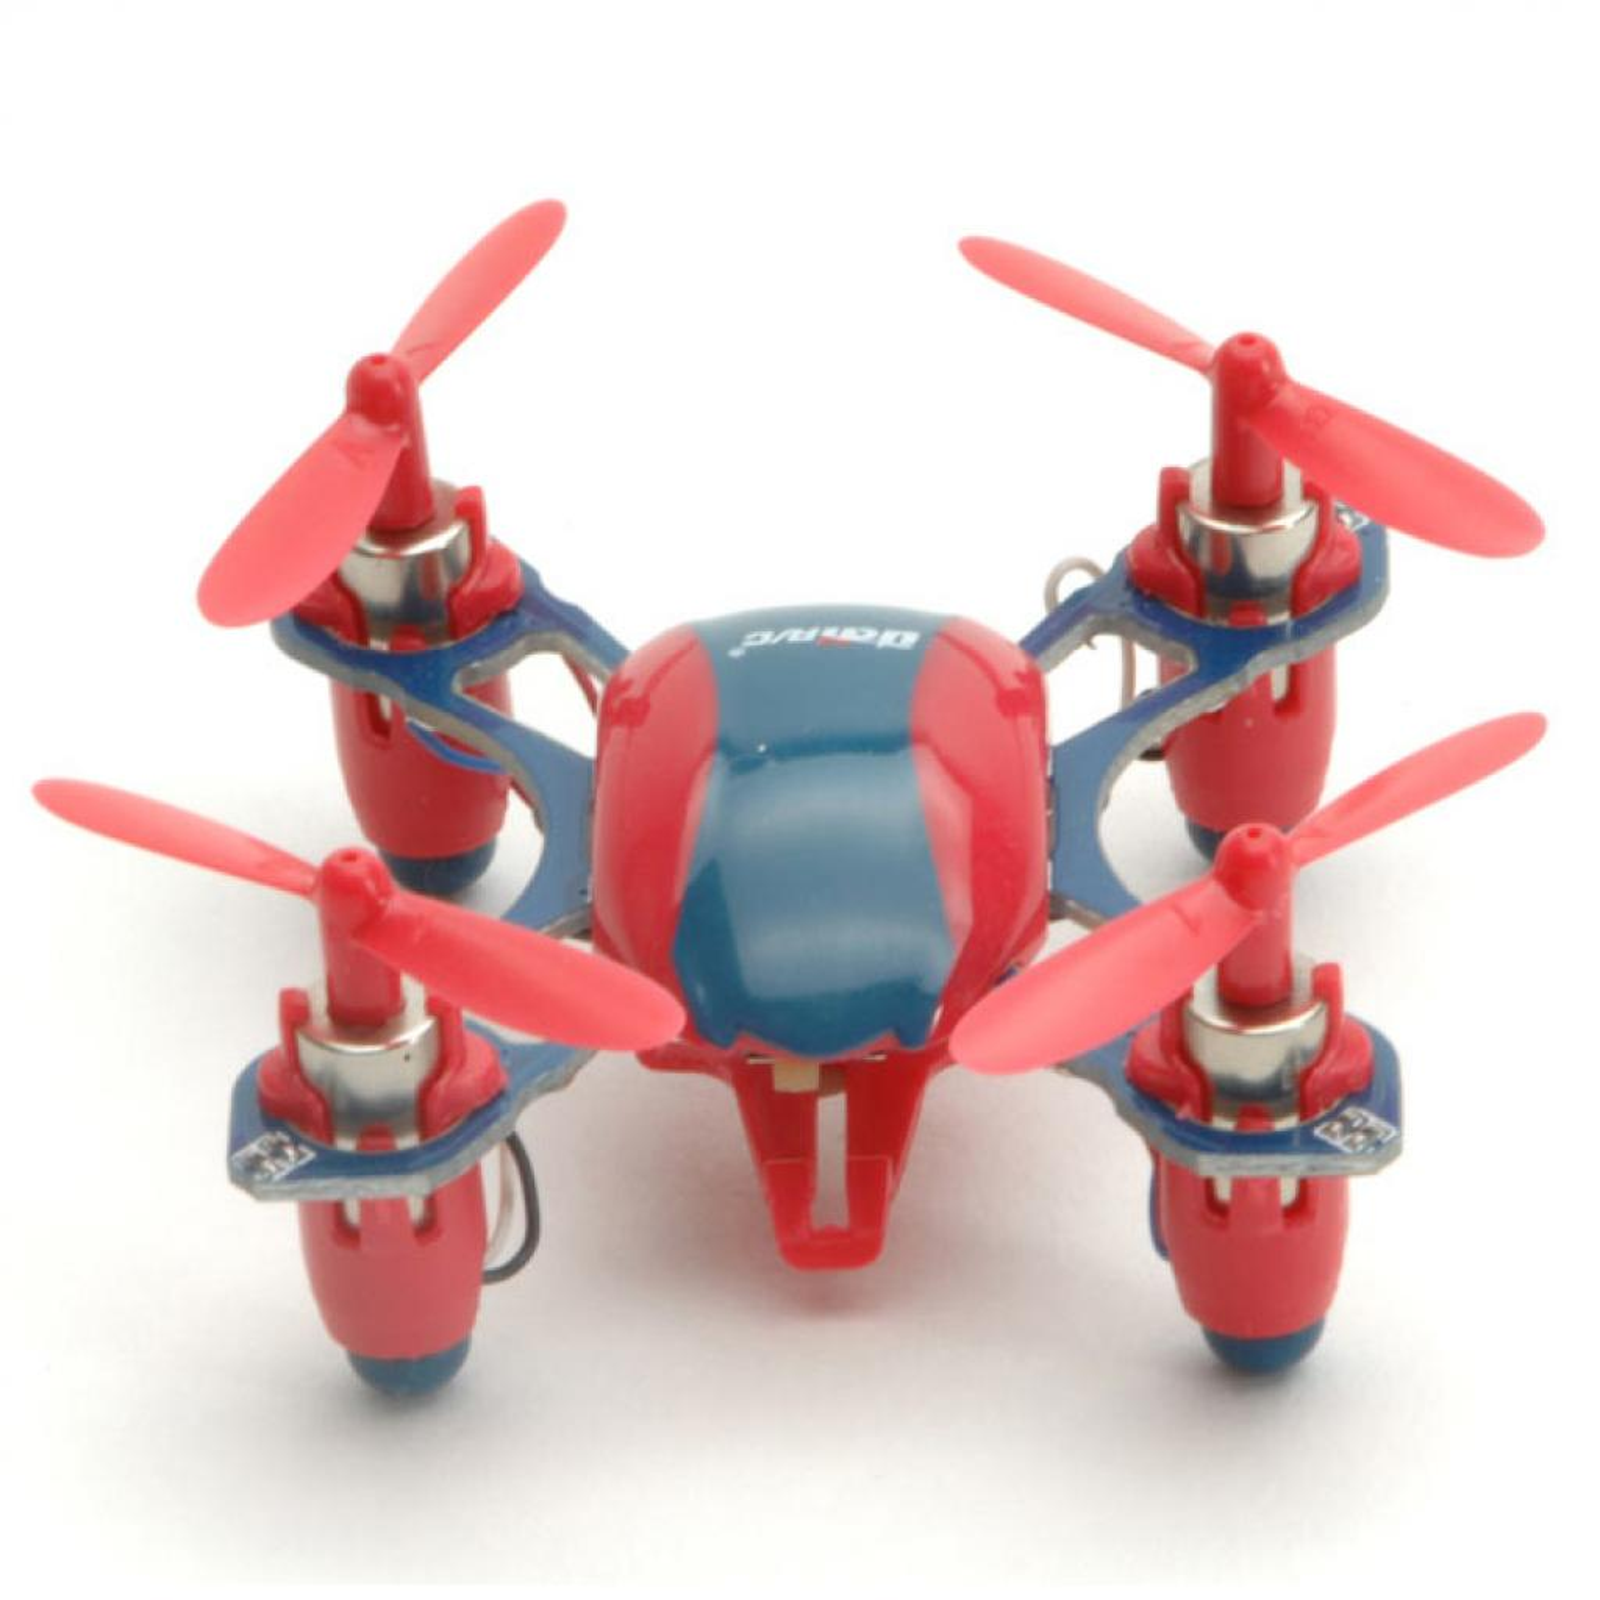 Квадрокоптер UDIRC 2,4 GHz 40 мм мини 3.7V (U840 Red) изображение 5